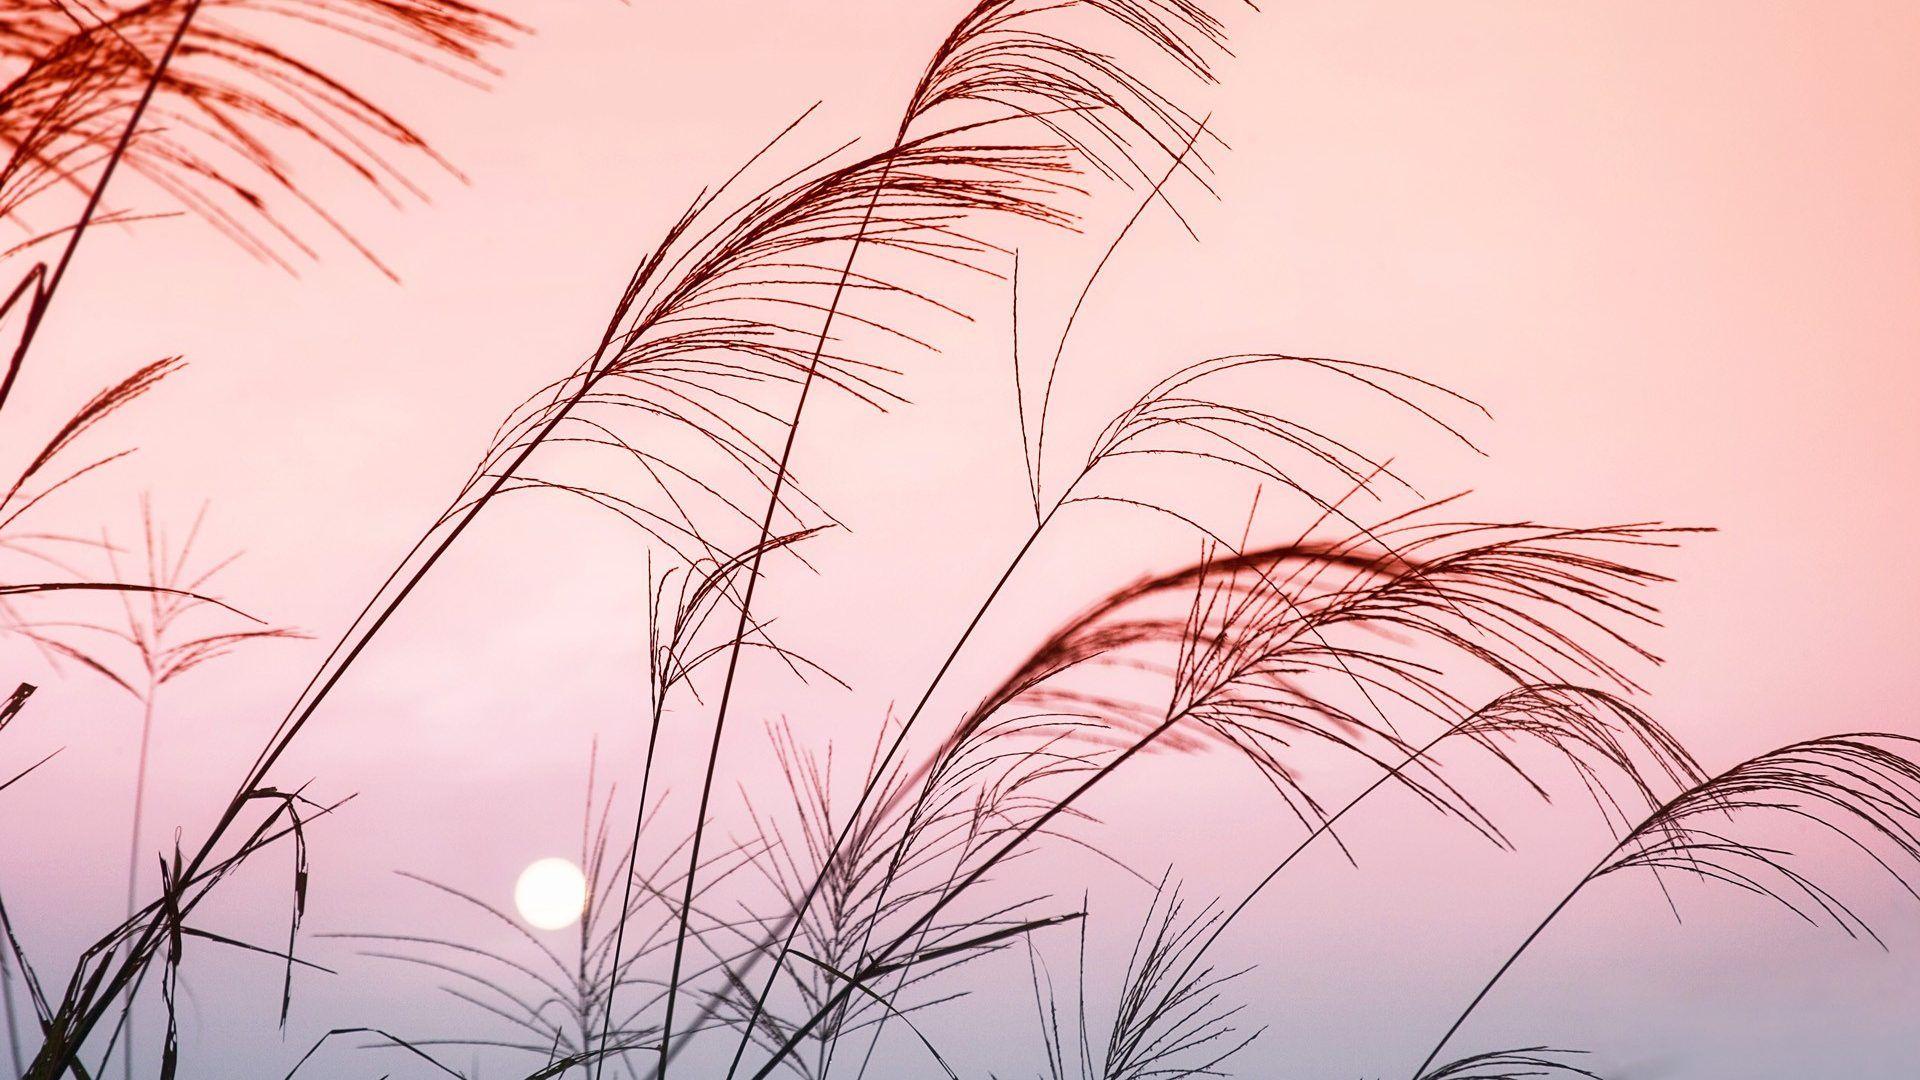 Mostnature Com Grass Pink Sky China Mobile Wallpapers Sky Aesthetic Sunset Wallpaper Landscape Wallpaper Hd wallpaper nature reeds grass sunset